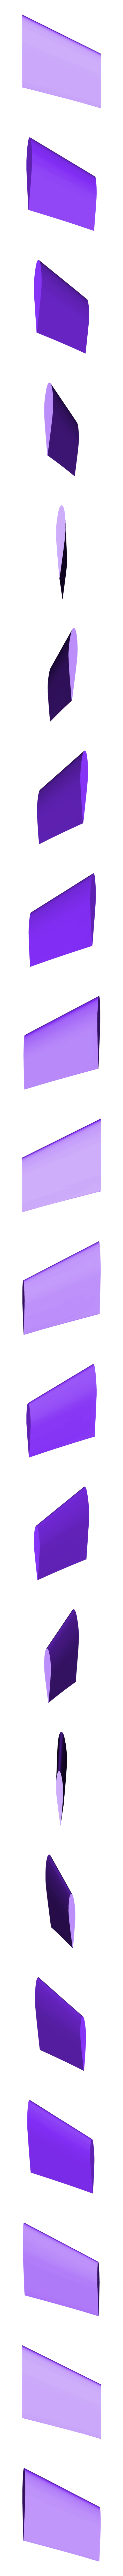 Wing2_R.STL Download STL file Phenom 300 • Template to 3D print, Eduardohbm